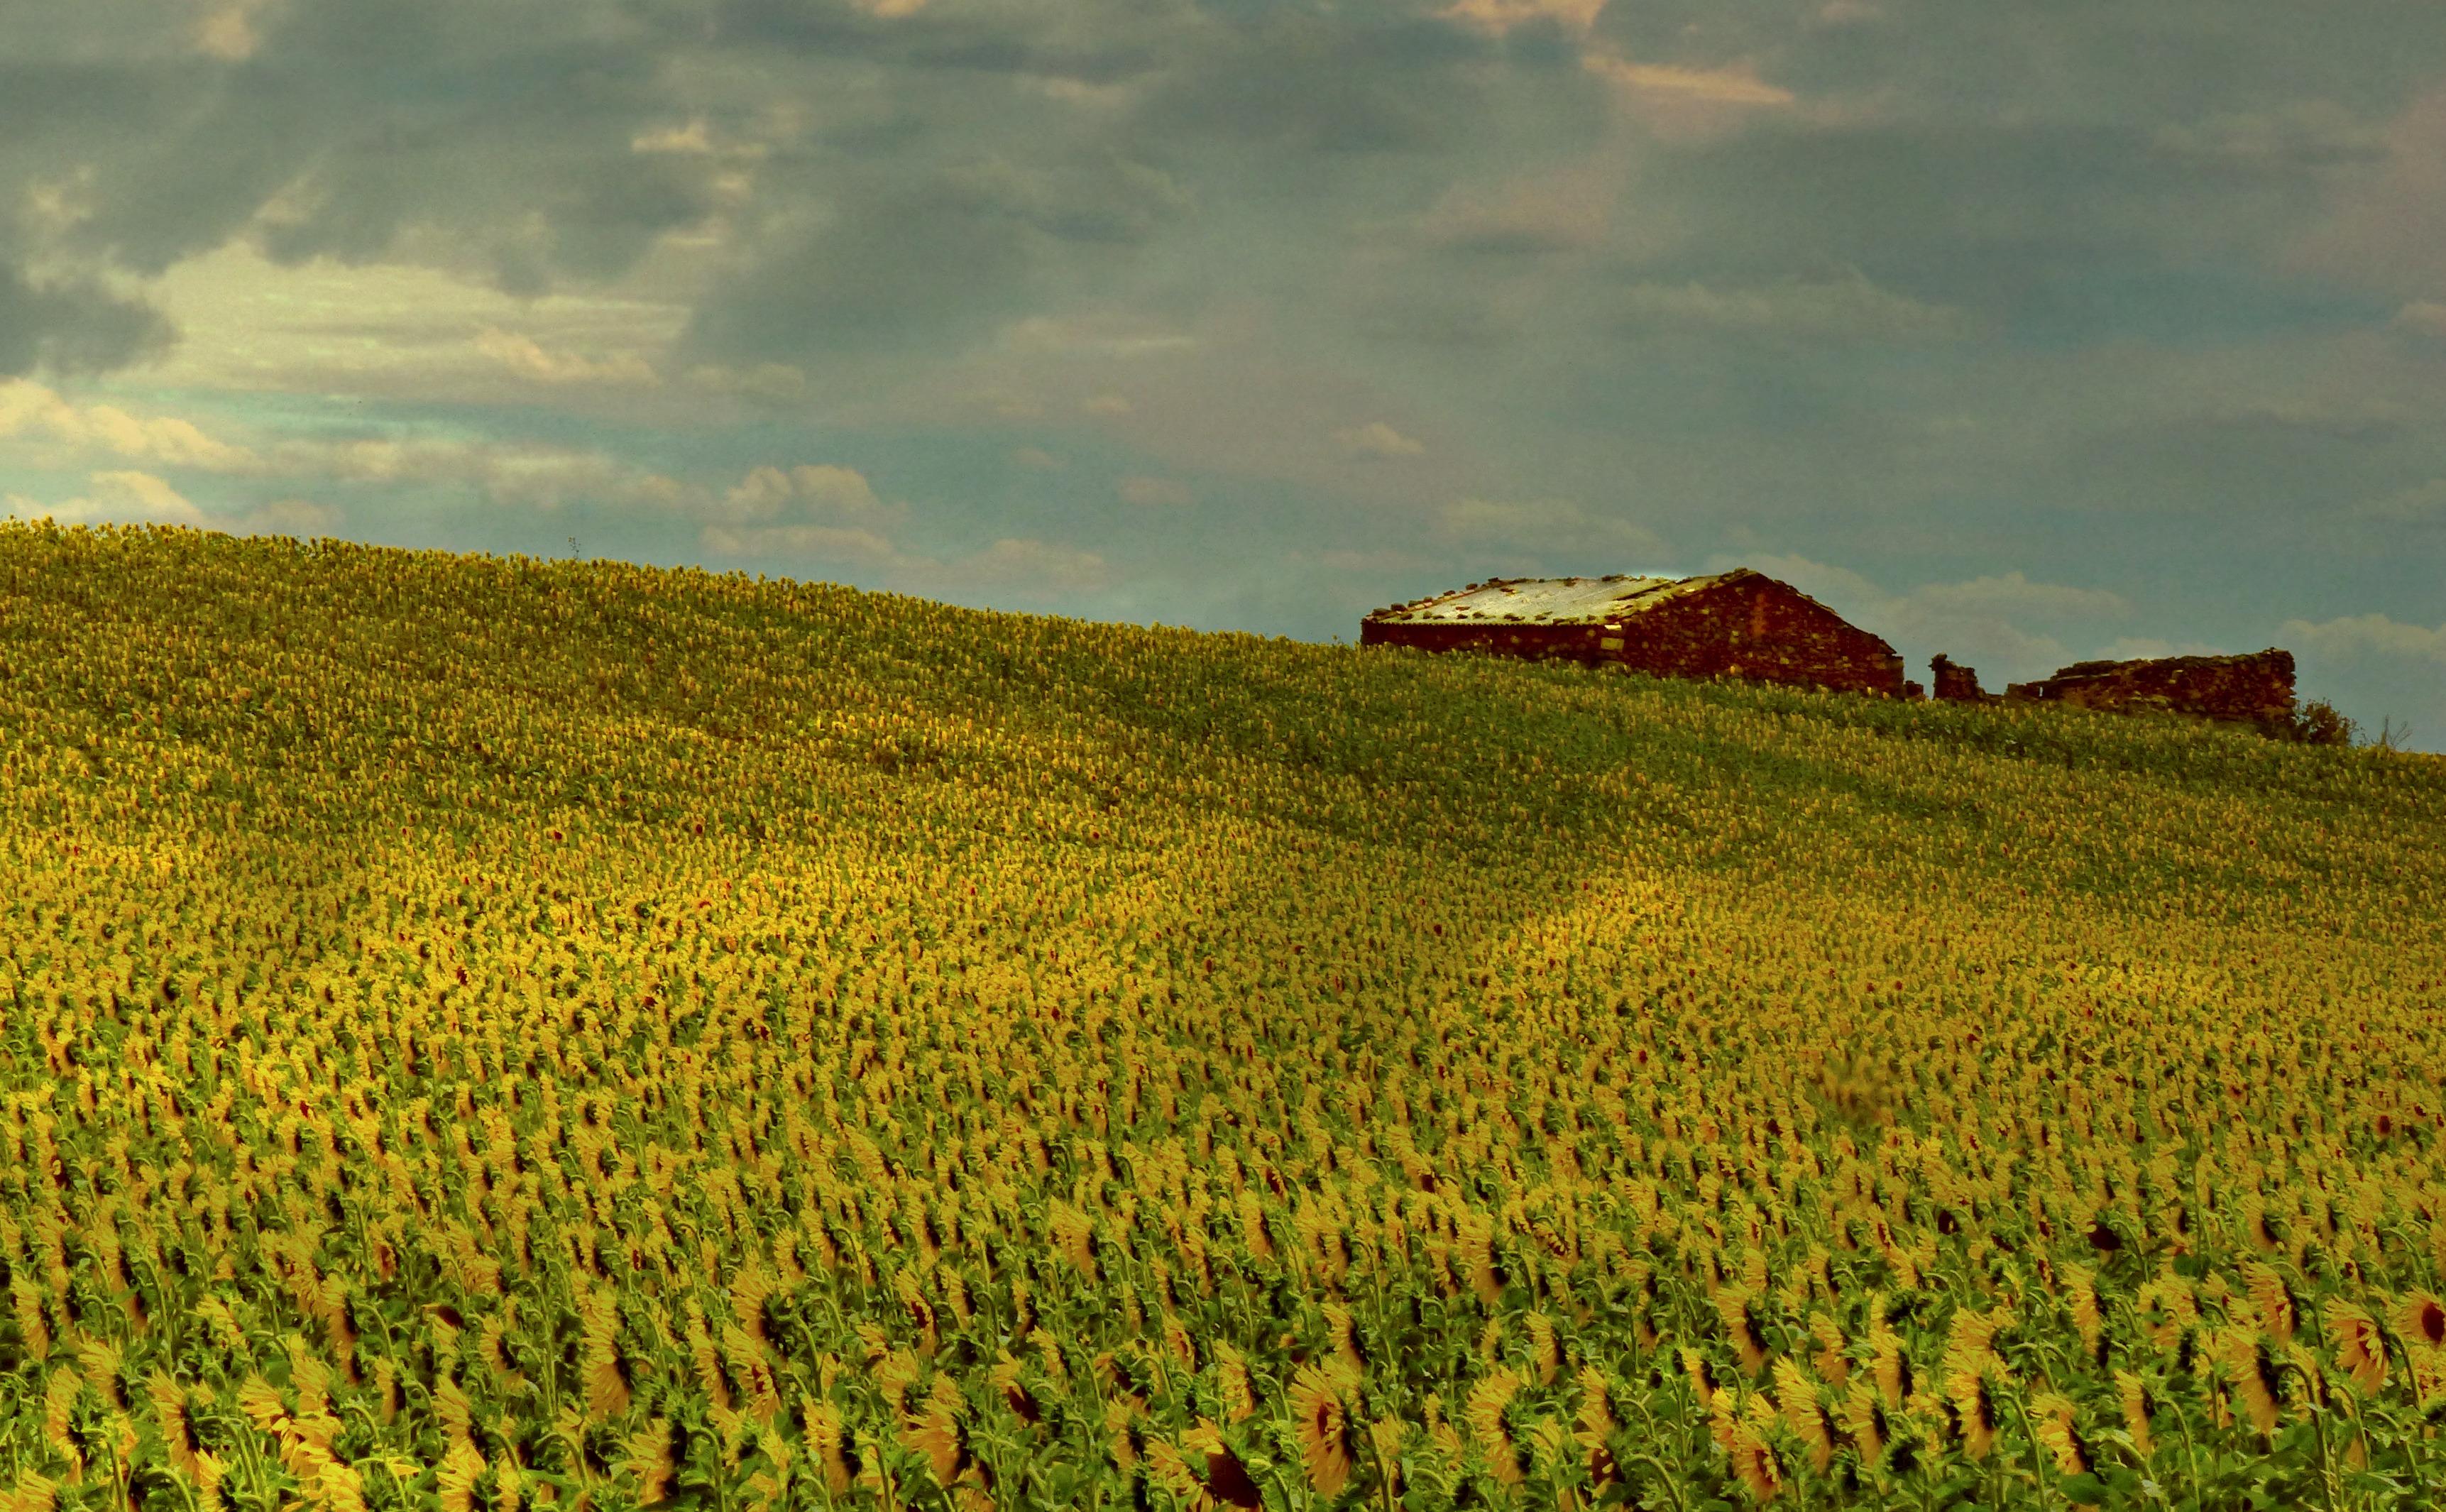 Wallpaper Landscape Hill Sky Field Farm Spain Campo